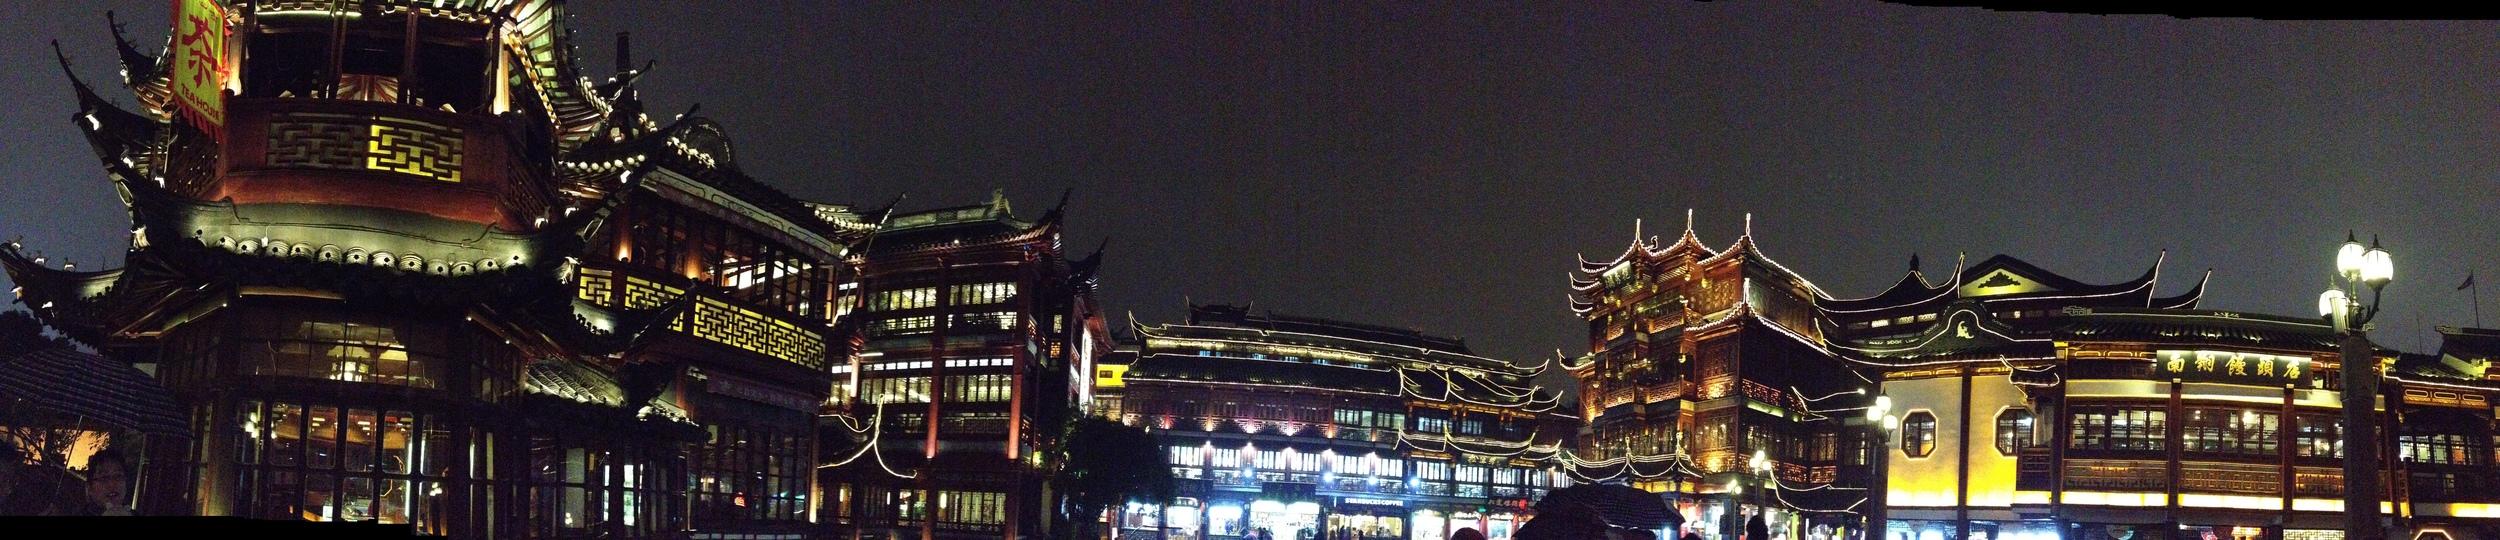 Chenghuang Temple, Yu Garden, Old Shanghai